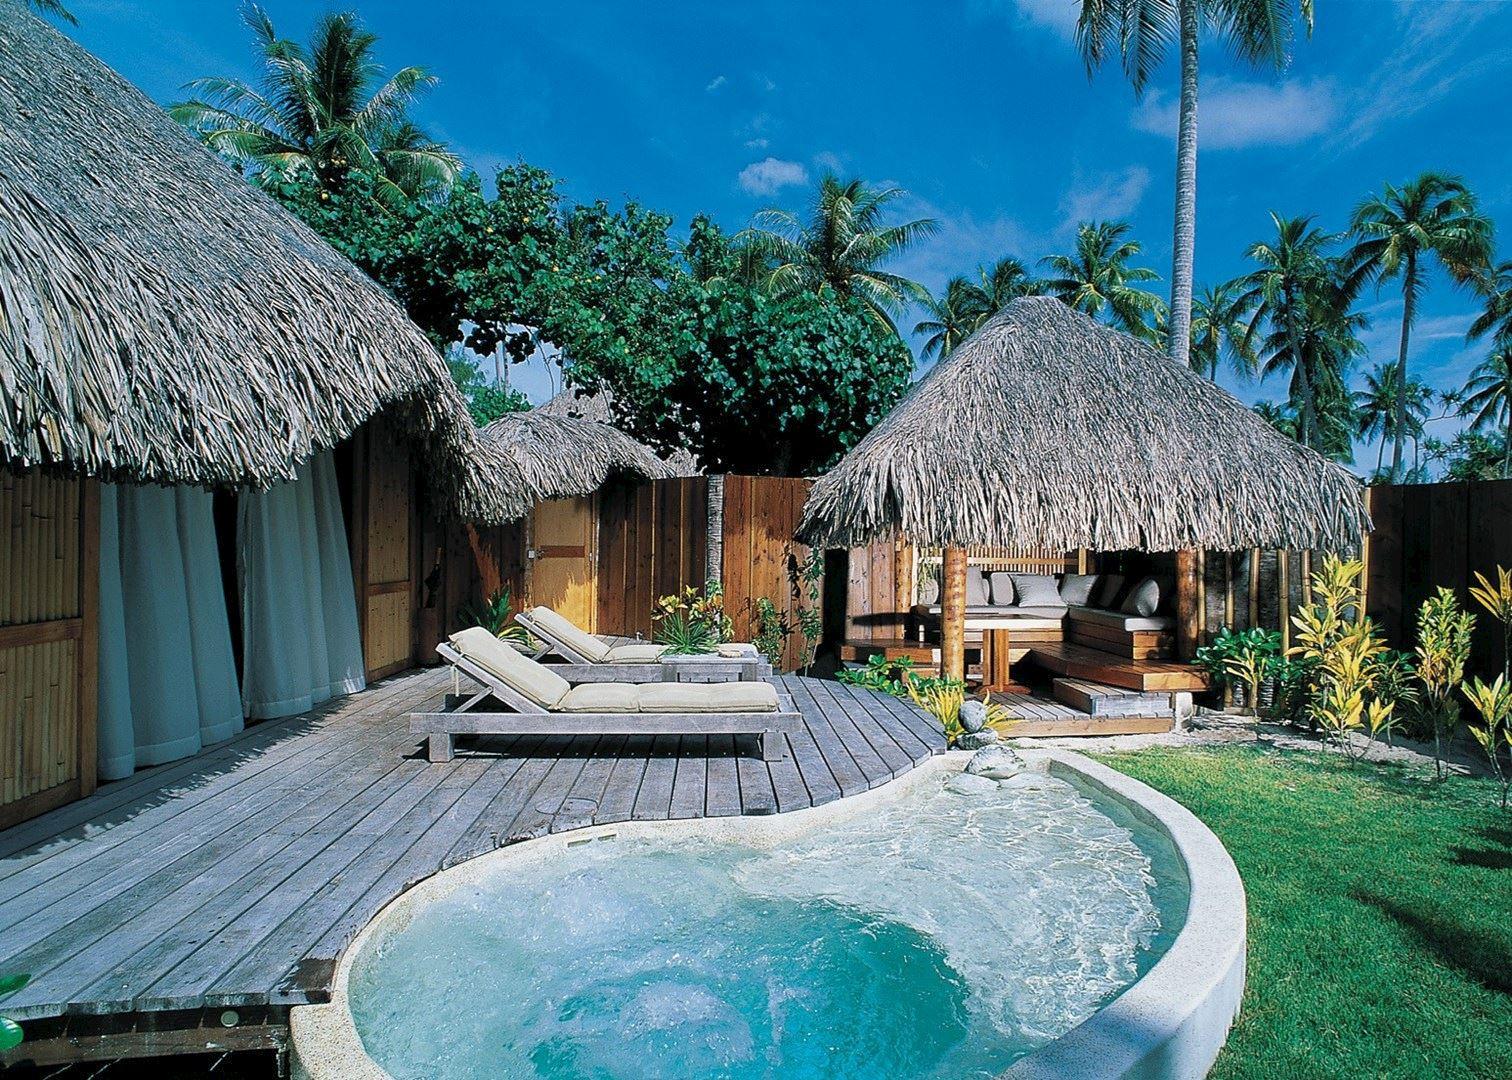 Pearl beach resort bora bora and moorea audley travel for Garden pool bungalow moorea pearl resort